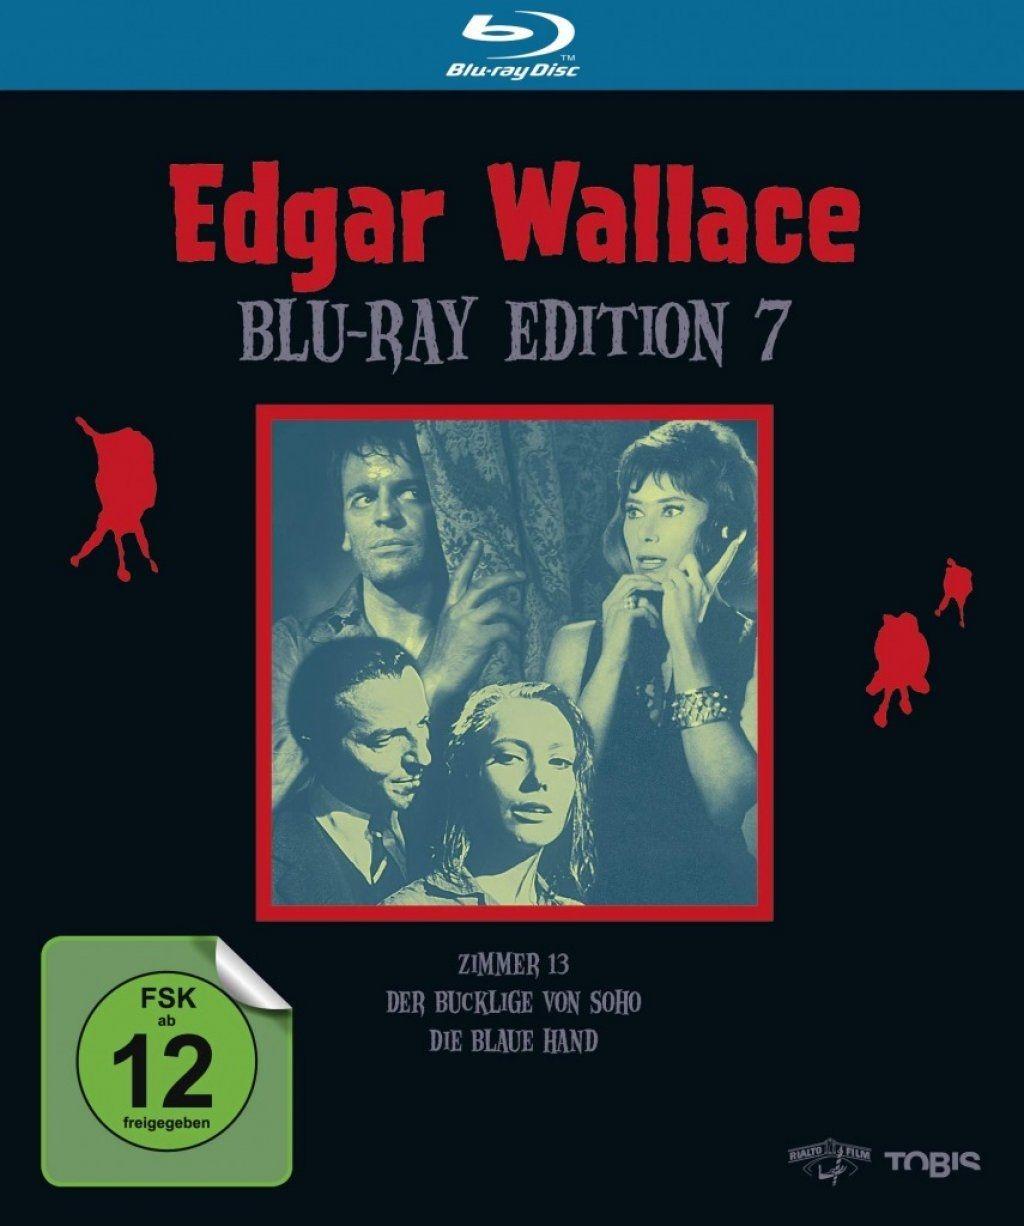 Edgar Wallace - Edition 7 (3 Discs) (BLURAY)